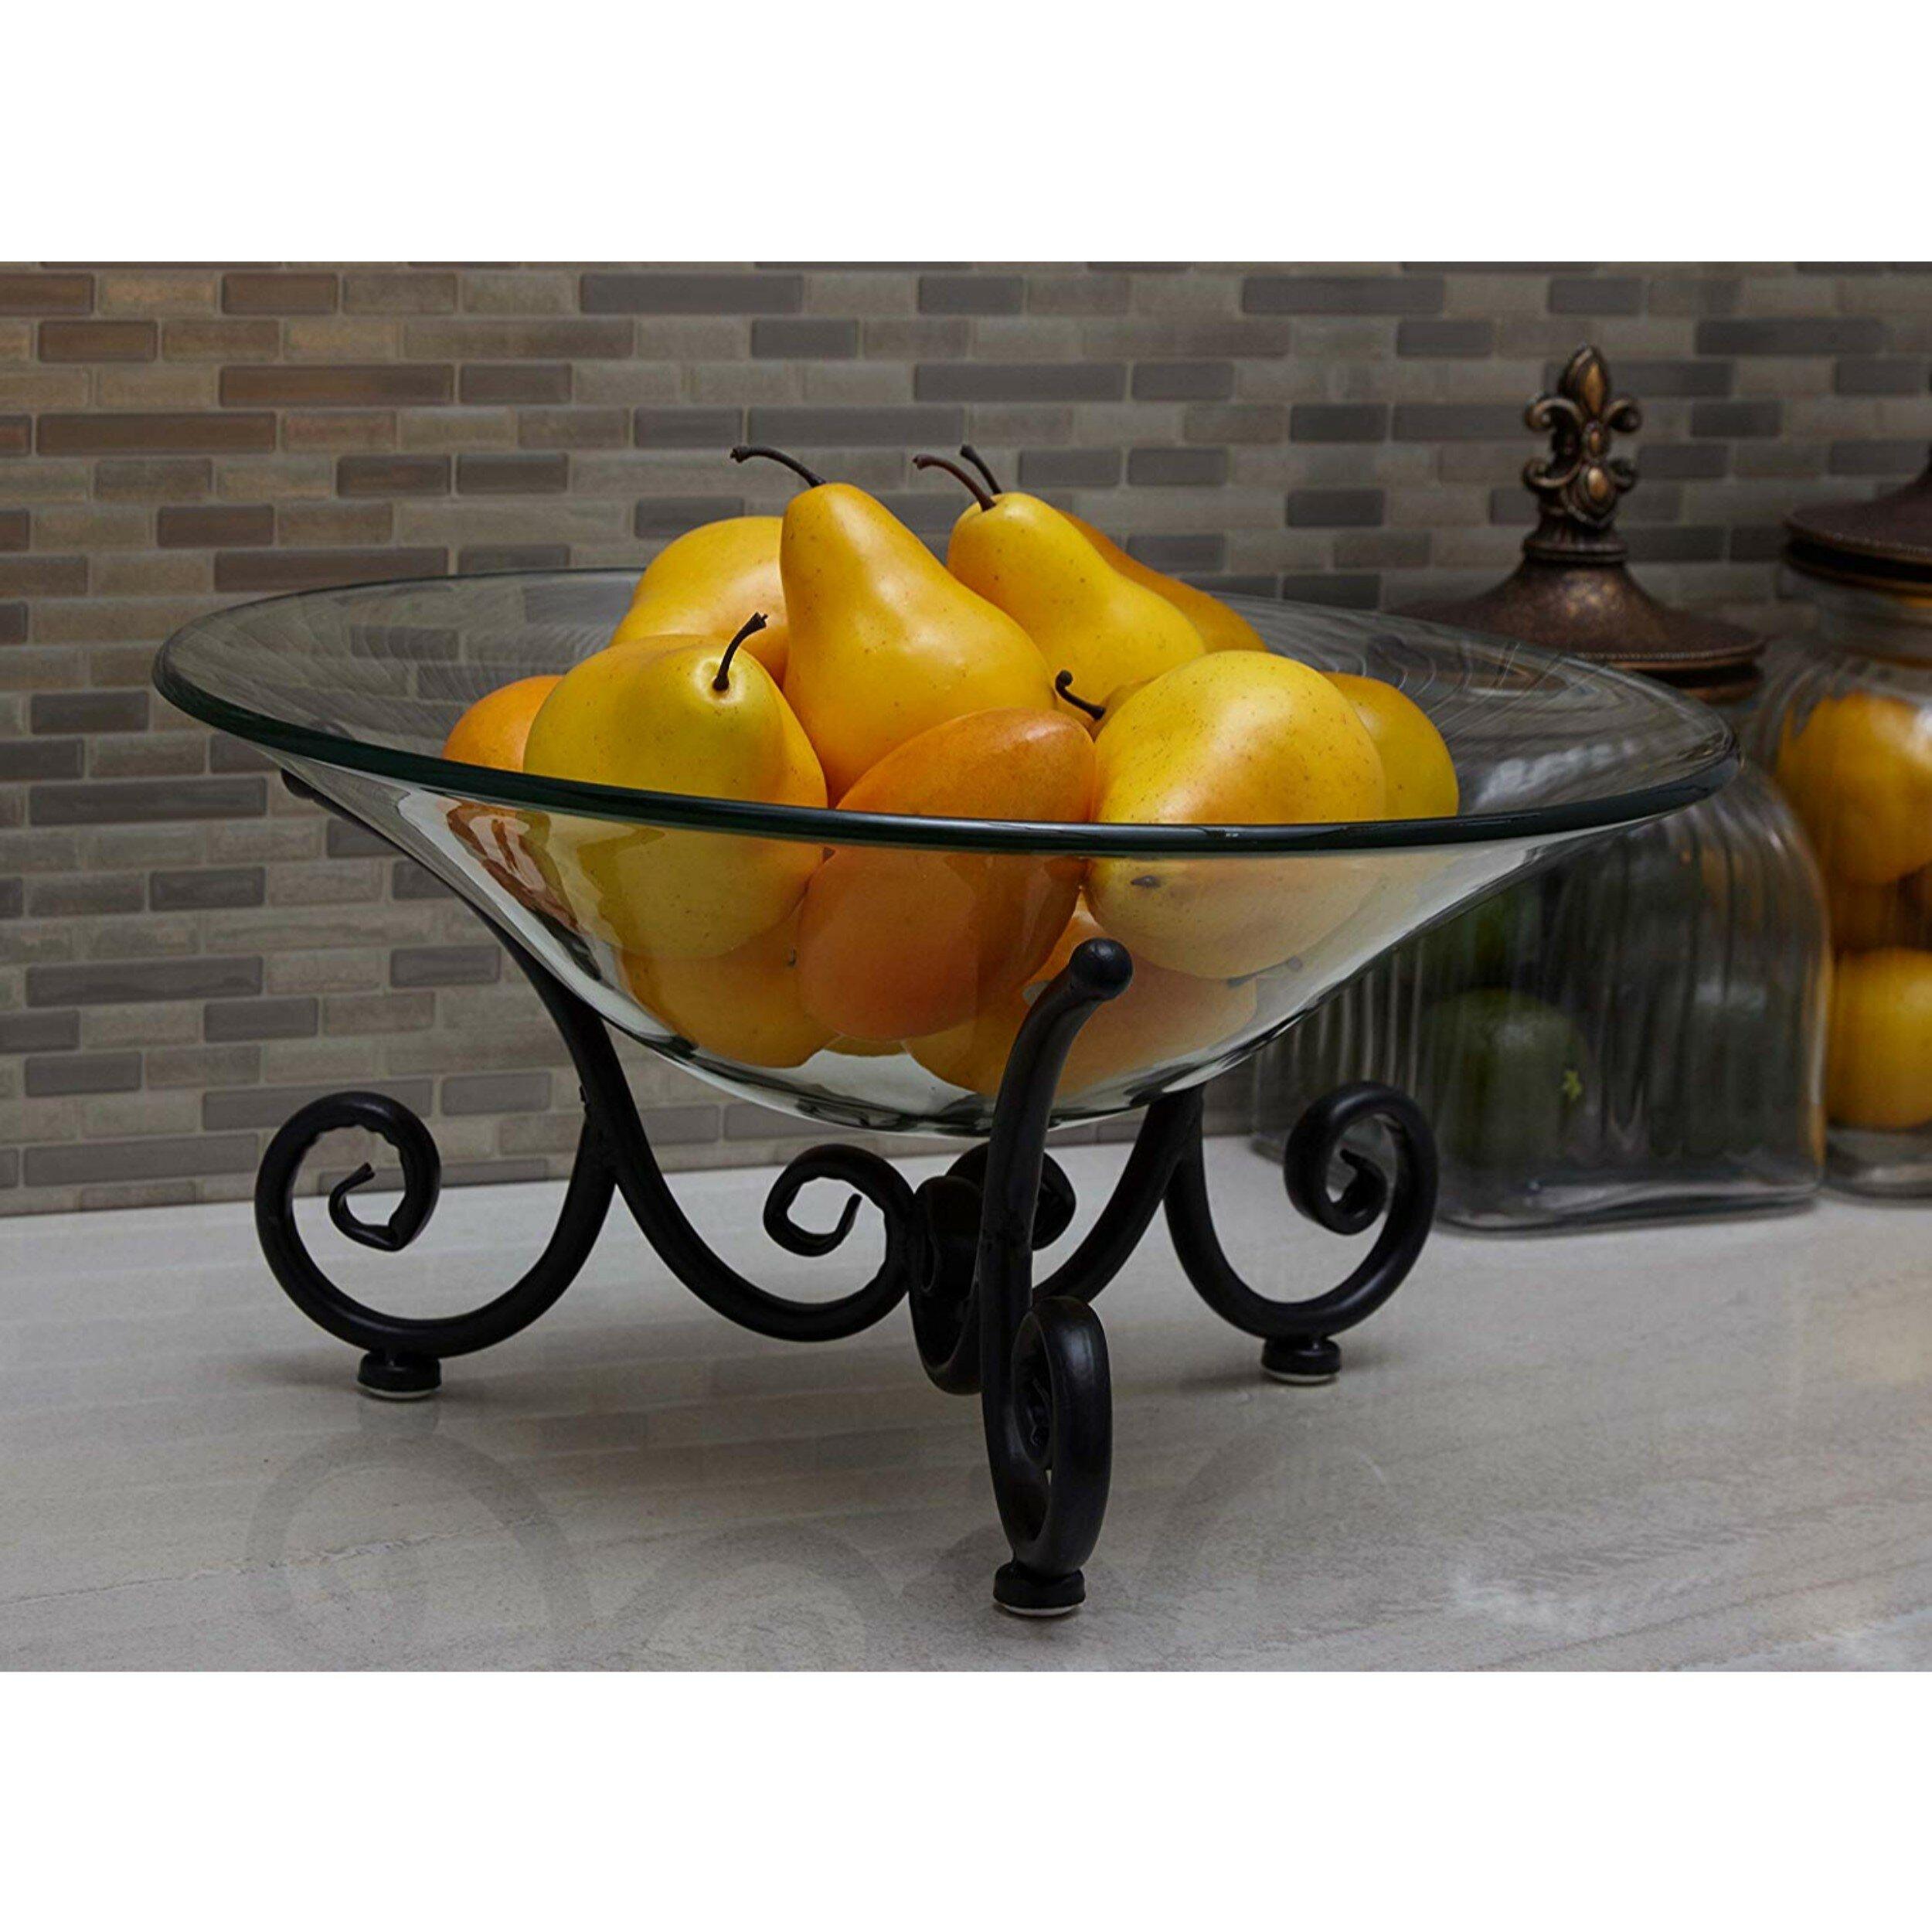 Decorative Bowl Urban Decor Table Centerpiece Minimalist Decor Fruit Bowl Metal Design Modern Bowl Home Office Decoration Black Bowl